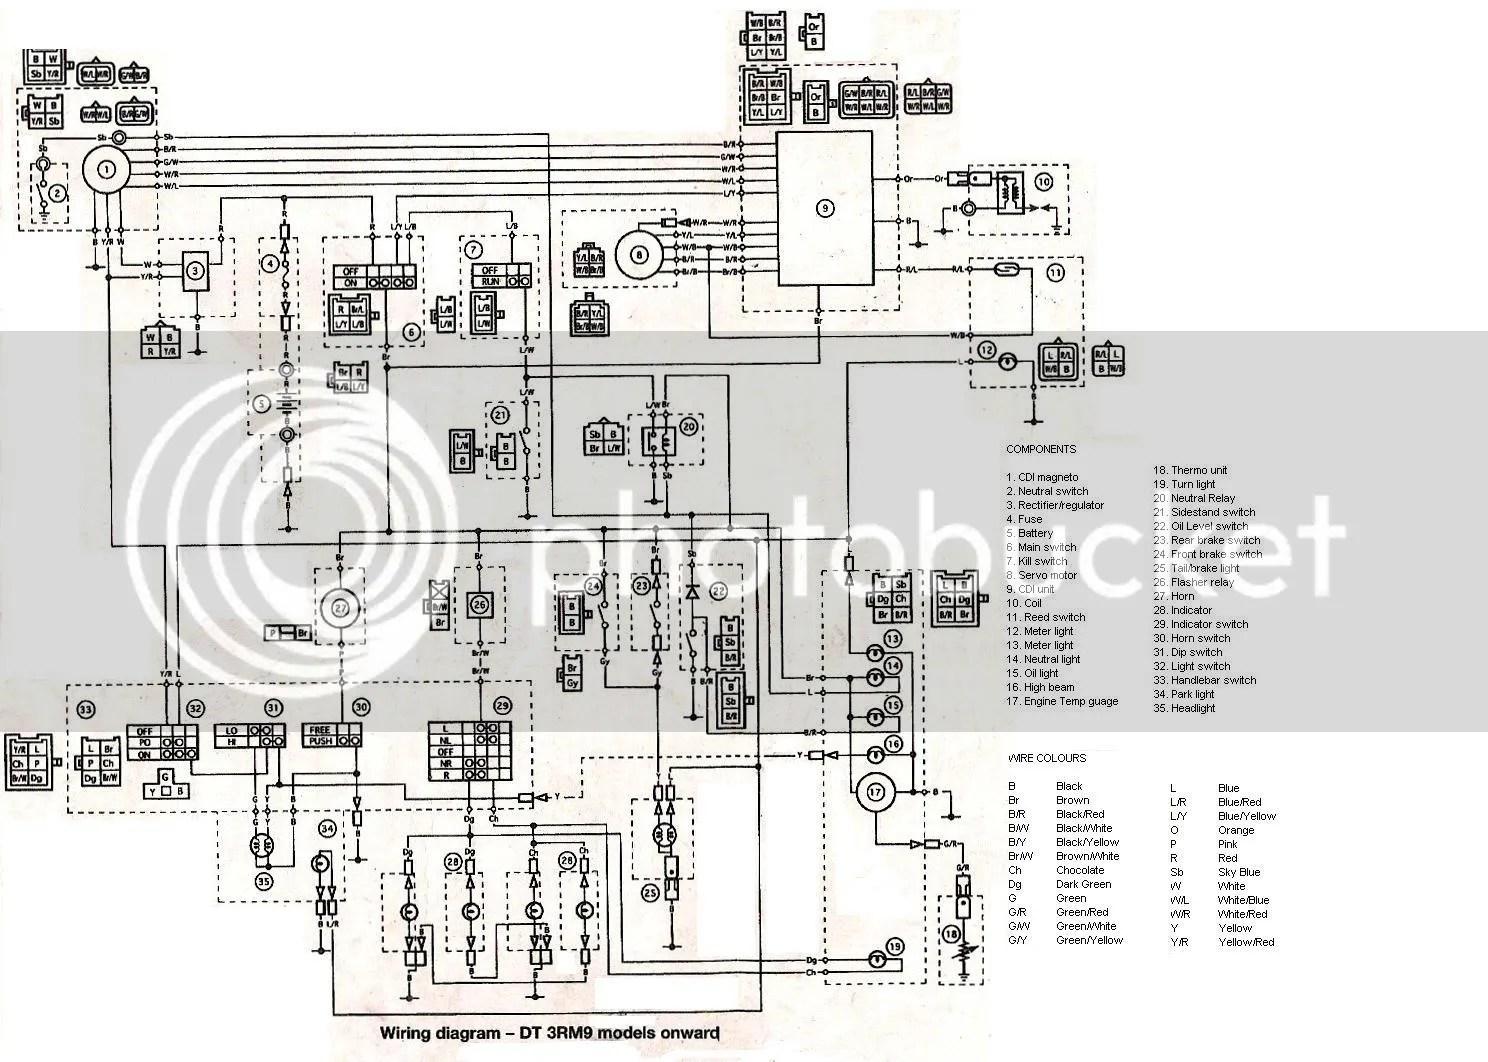 whizzer wiring diagram [ 1488 x 1062 Pixel ]